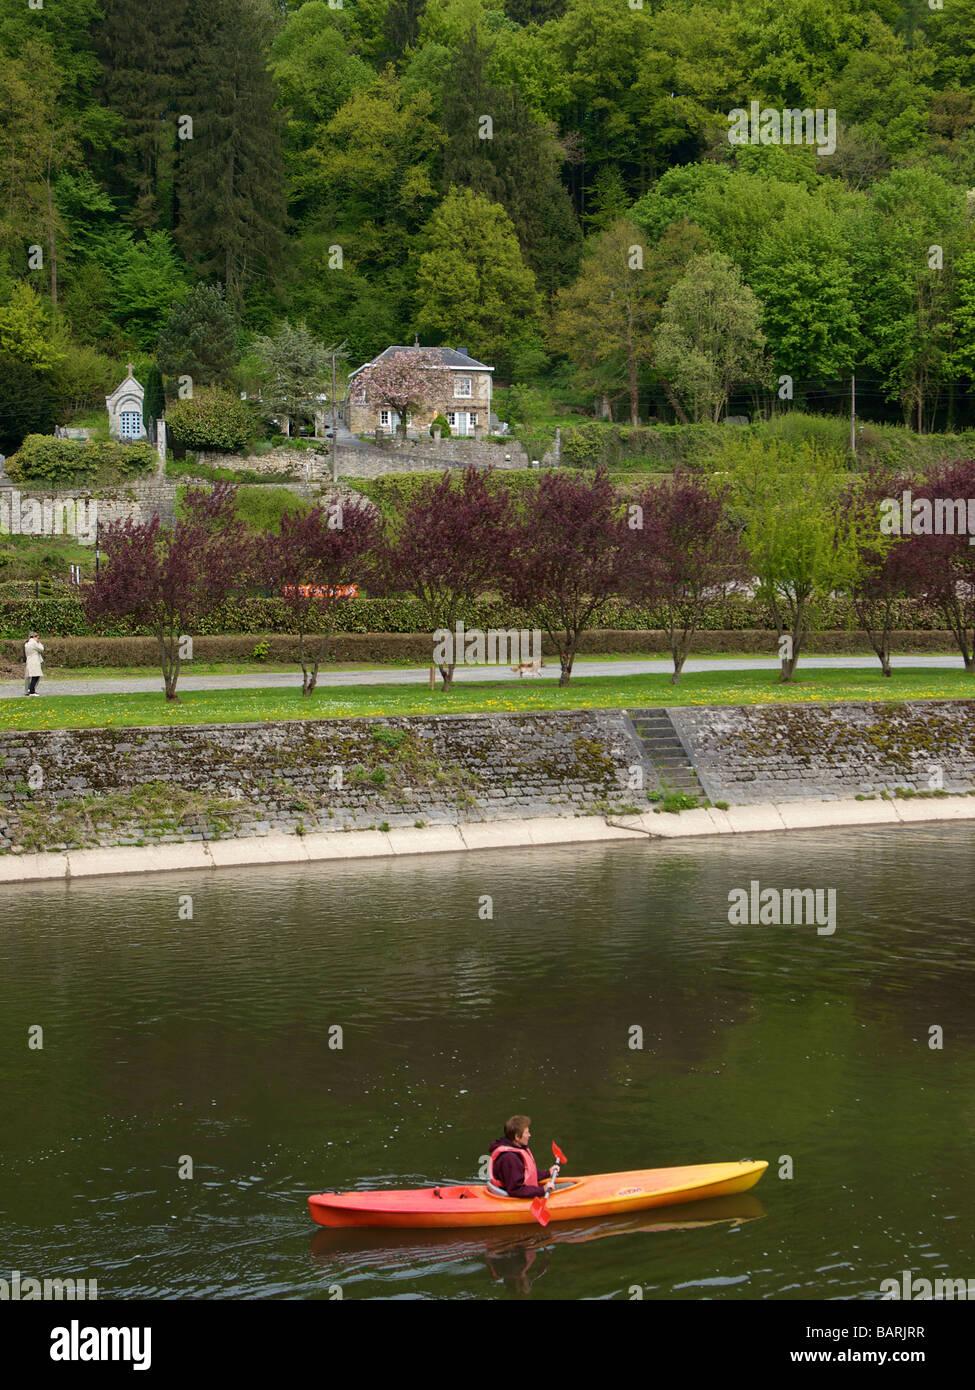 Kayaking on the Ourthe near Durbuy Belgium - Stock Image